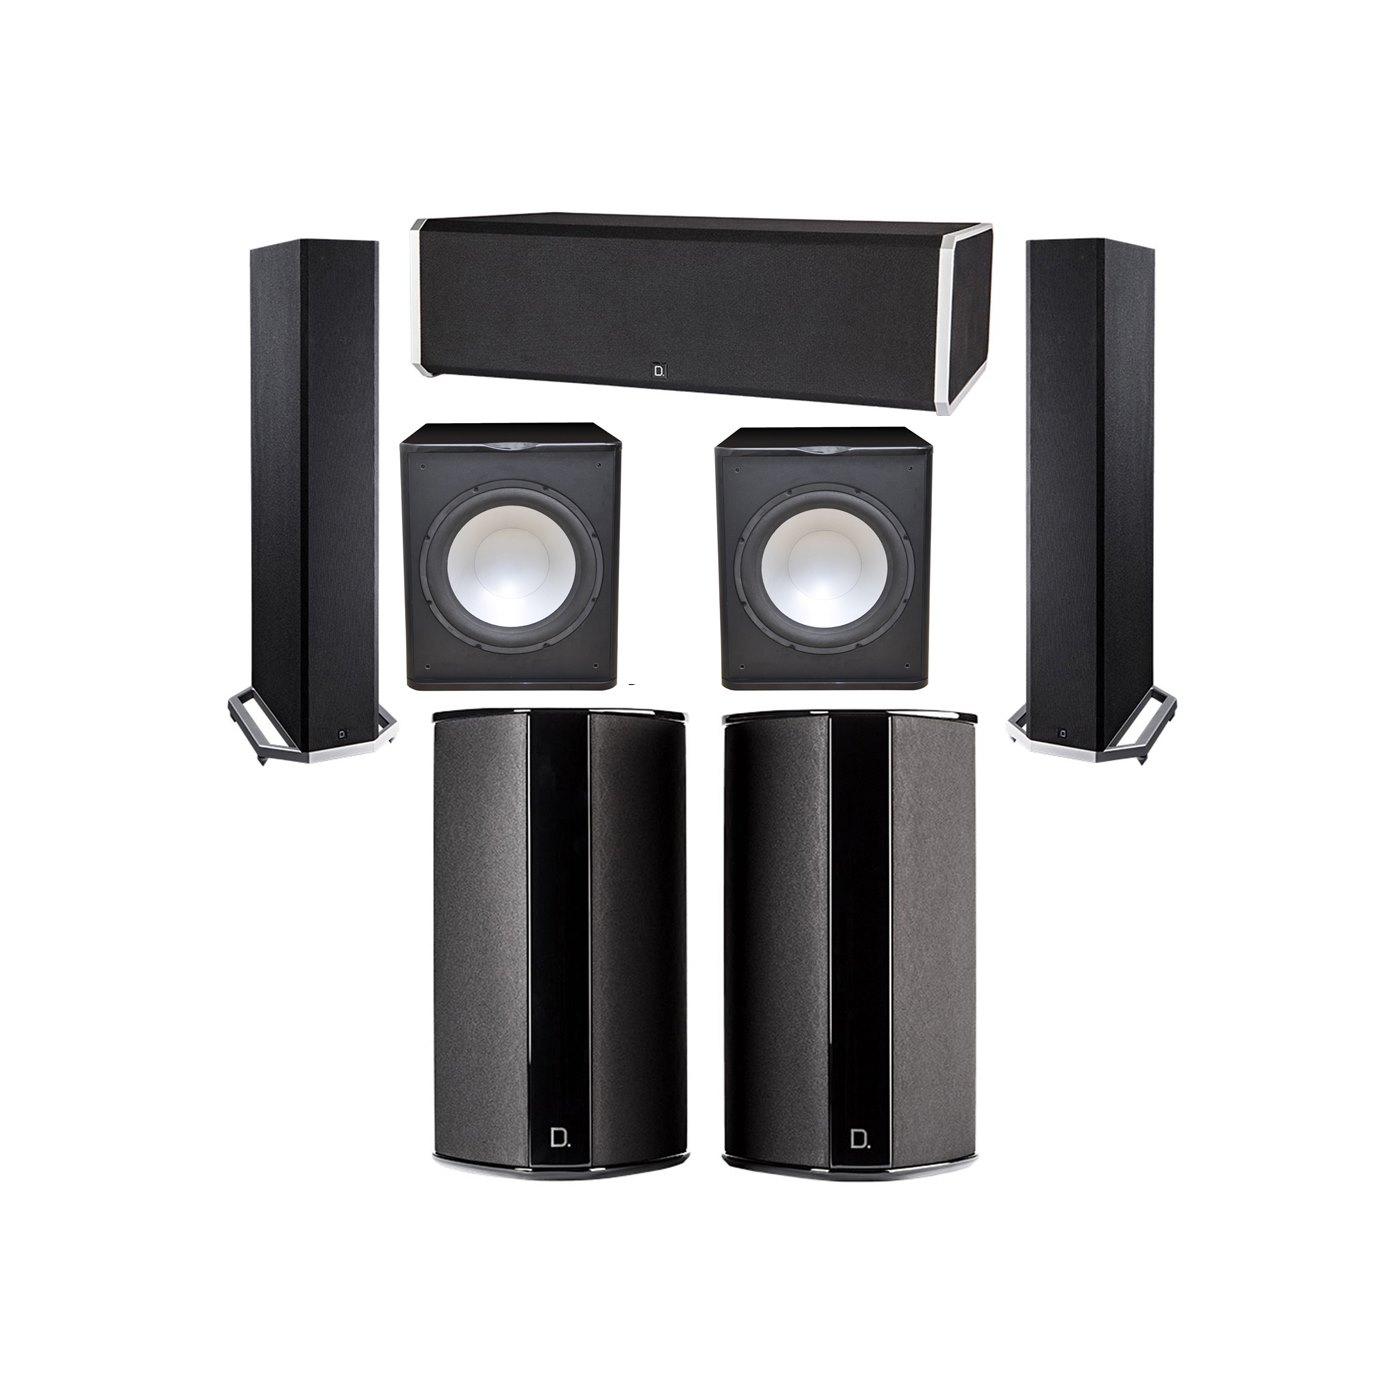 Definitive Technology 5.2 System with 2 BP9020 Tower Speakers, 1 CS9080 Center Channel Speaker, 2 SR9080 Surround Speaker, 2 Premier Acoustic PA-150 Subwoofer